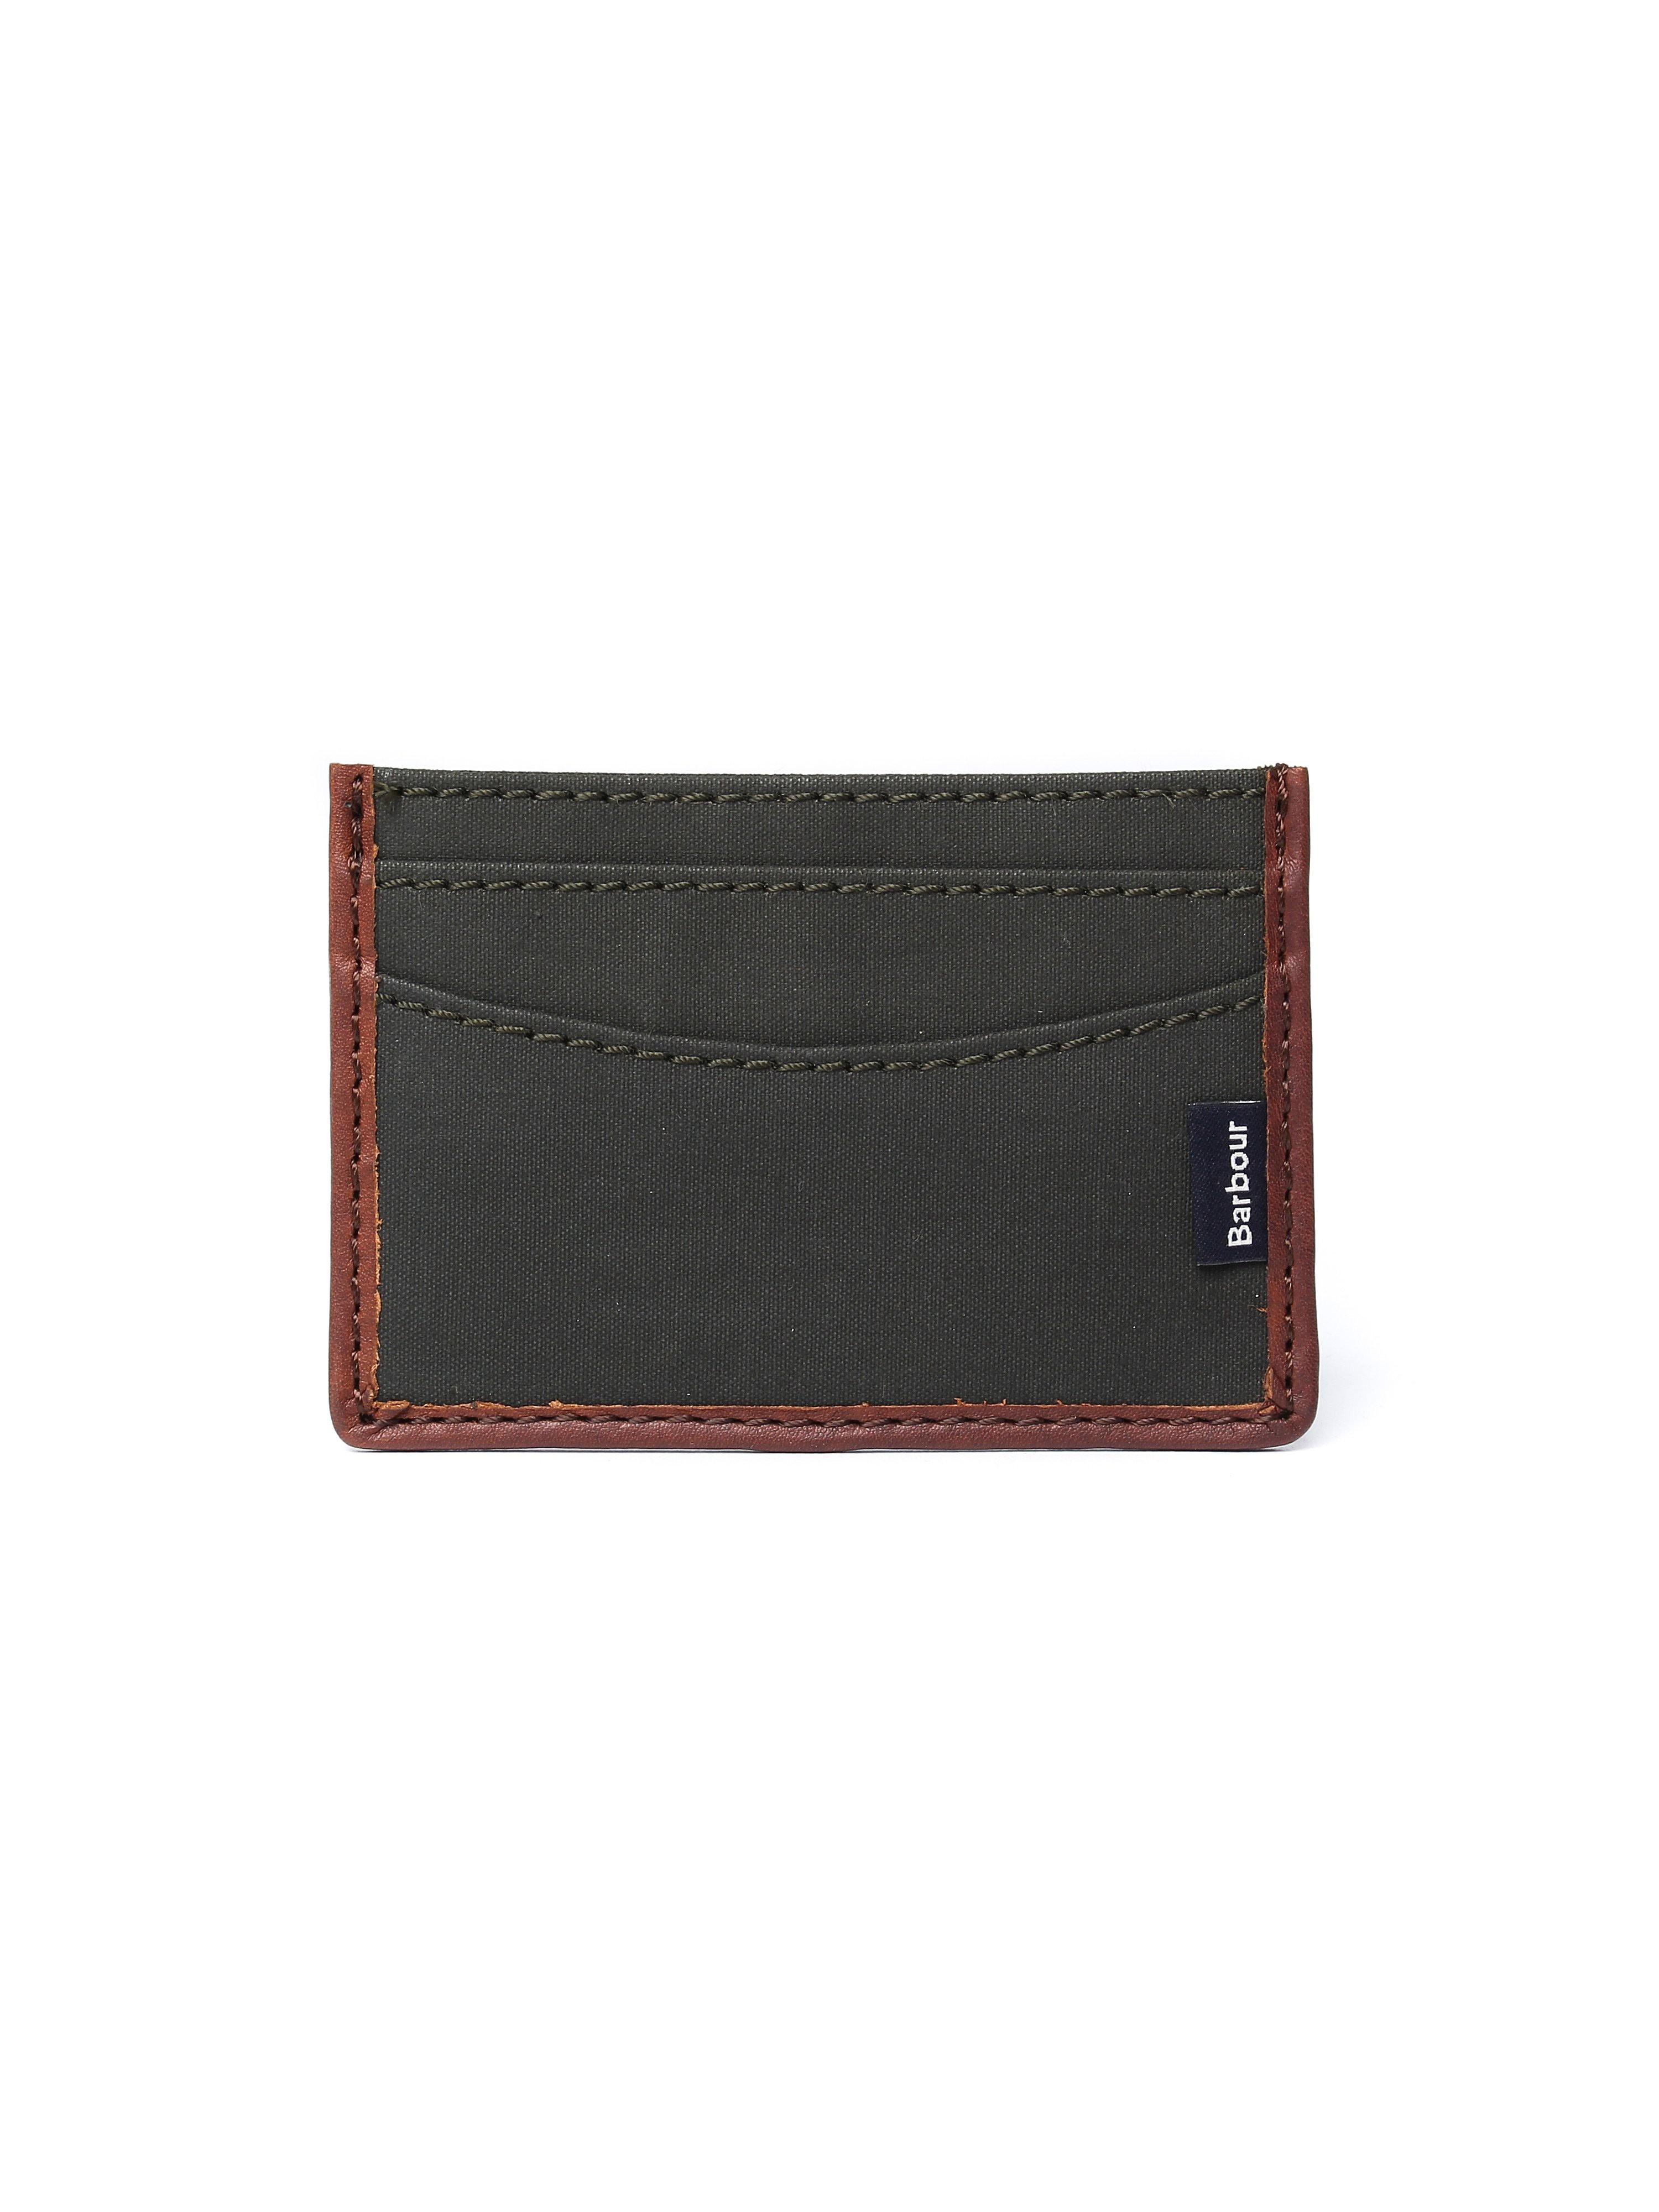 Barbour Men's Dry Wax Card Holder - Olive